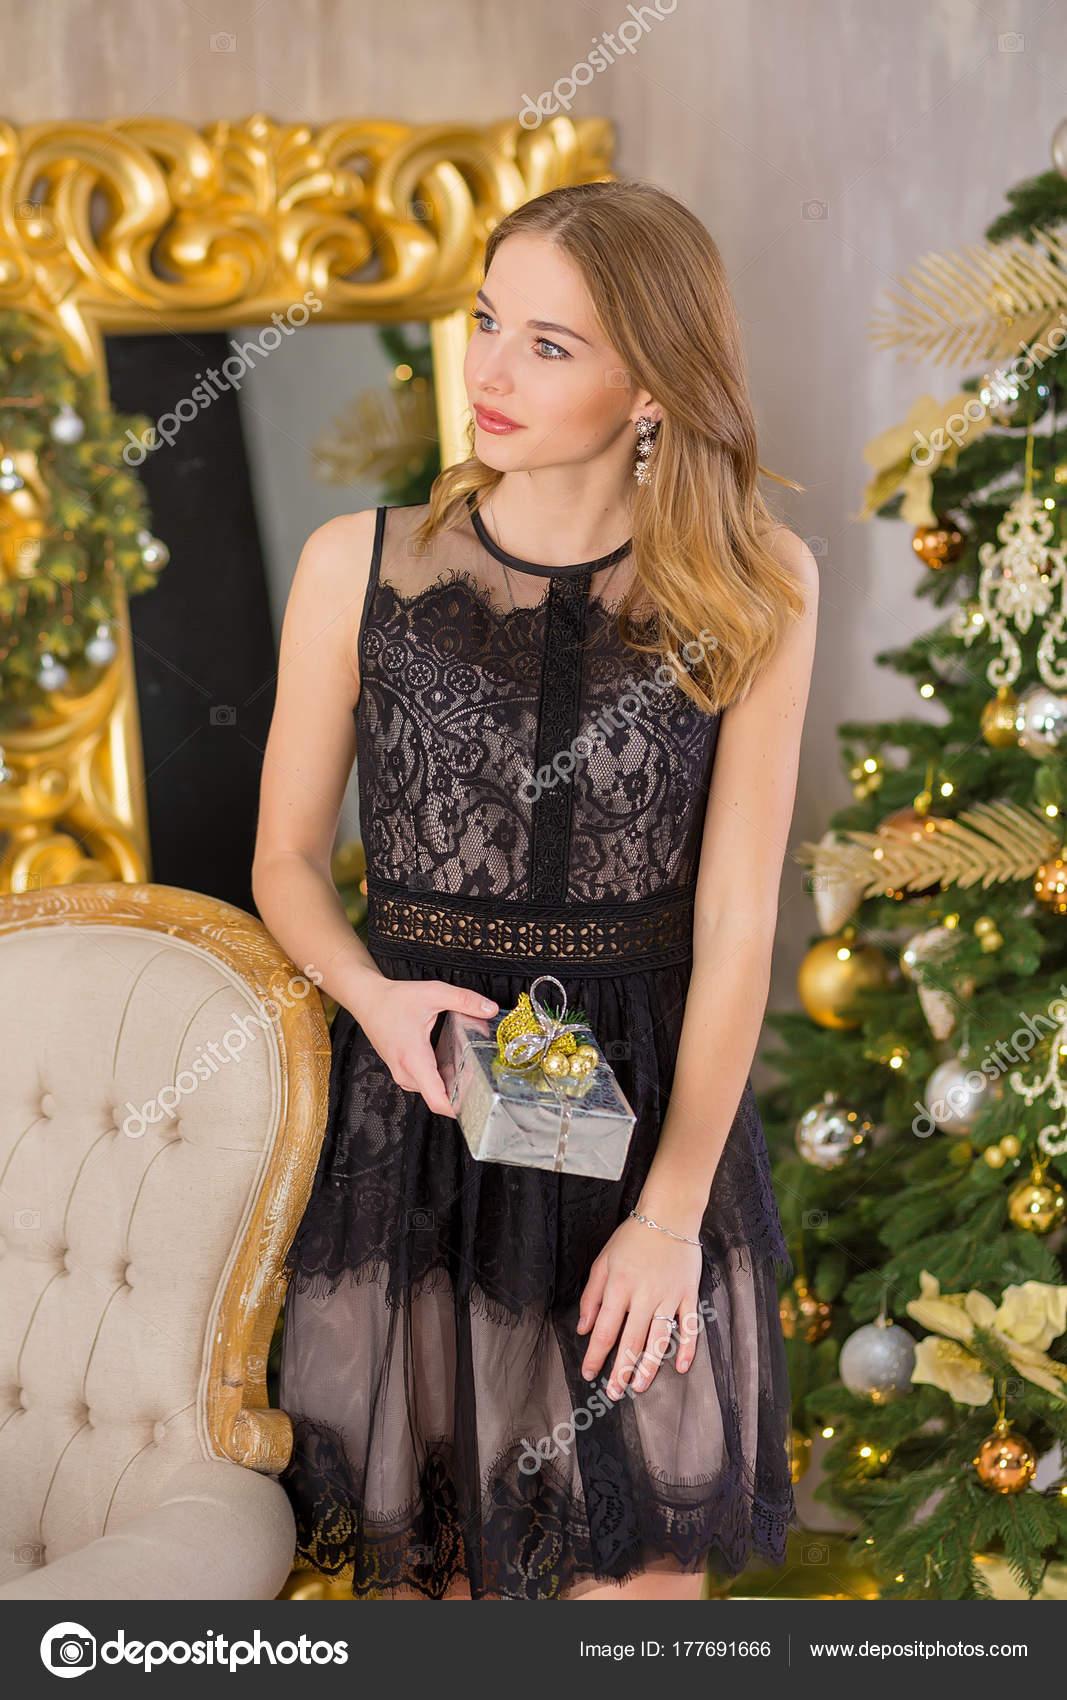 Beauty Fashion Woman Christmas Background New Year Tree Vogue Style